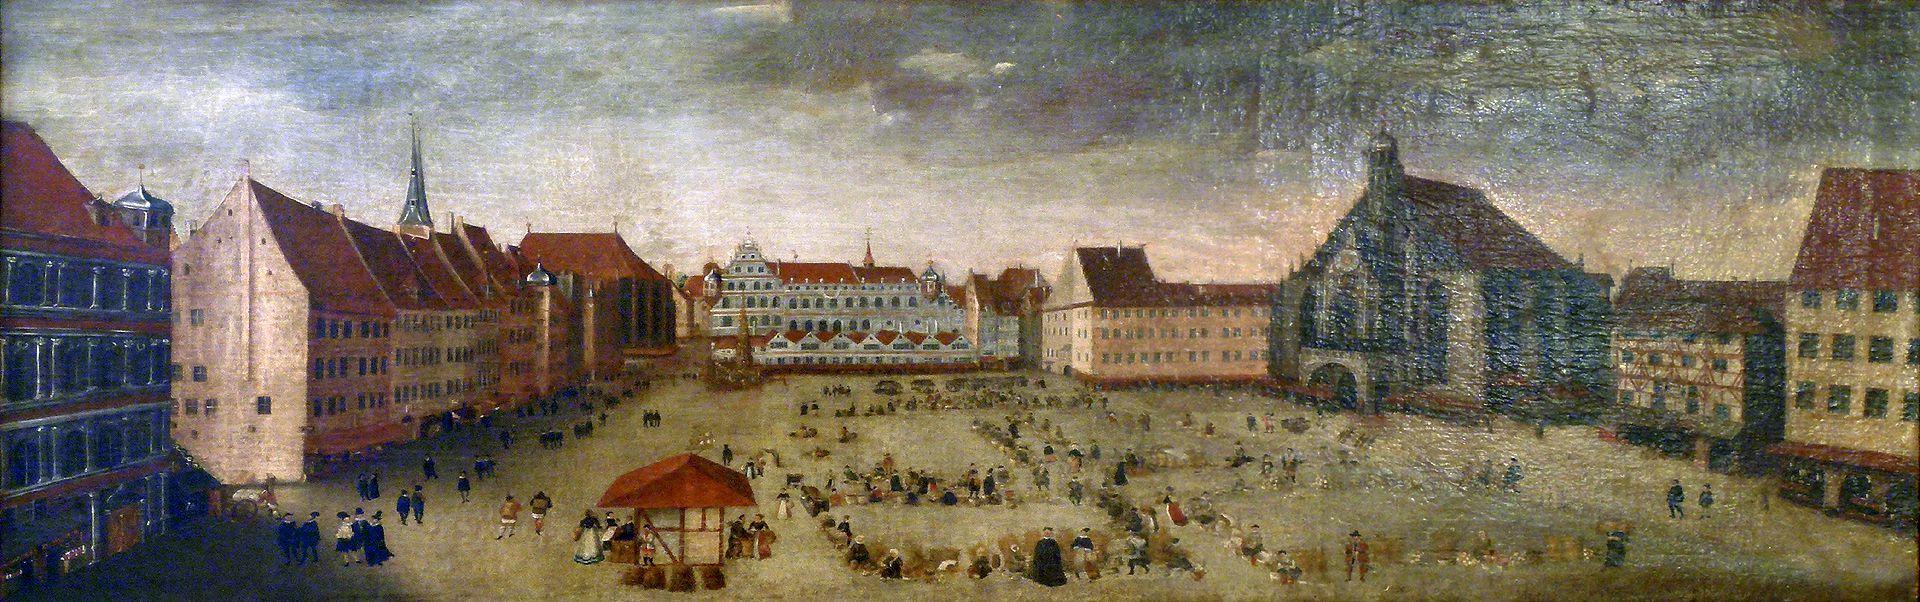 Der Nürnberger Hauptmarkt Gesamtansicht